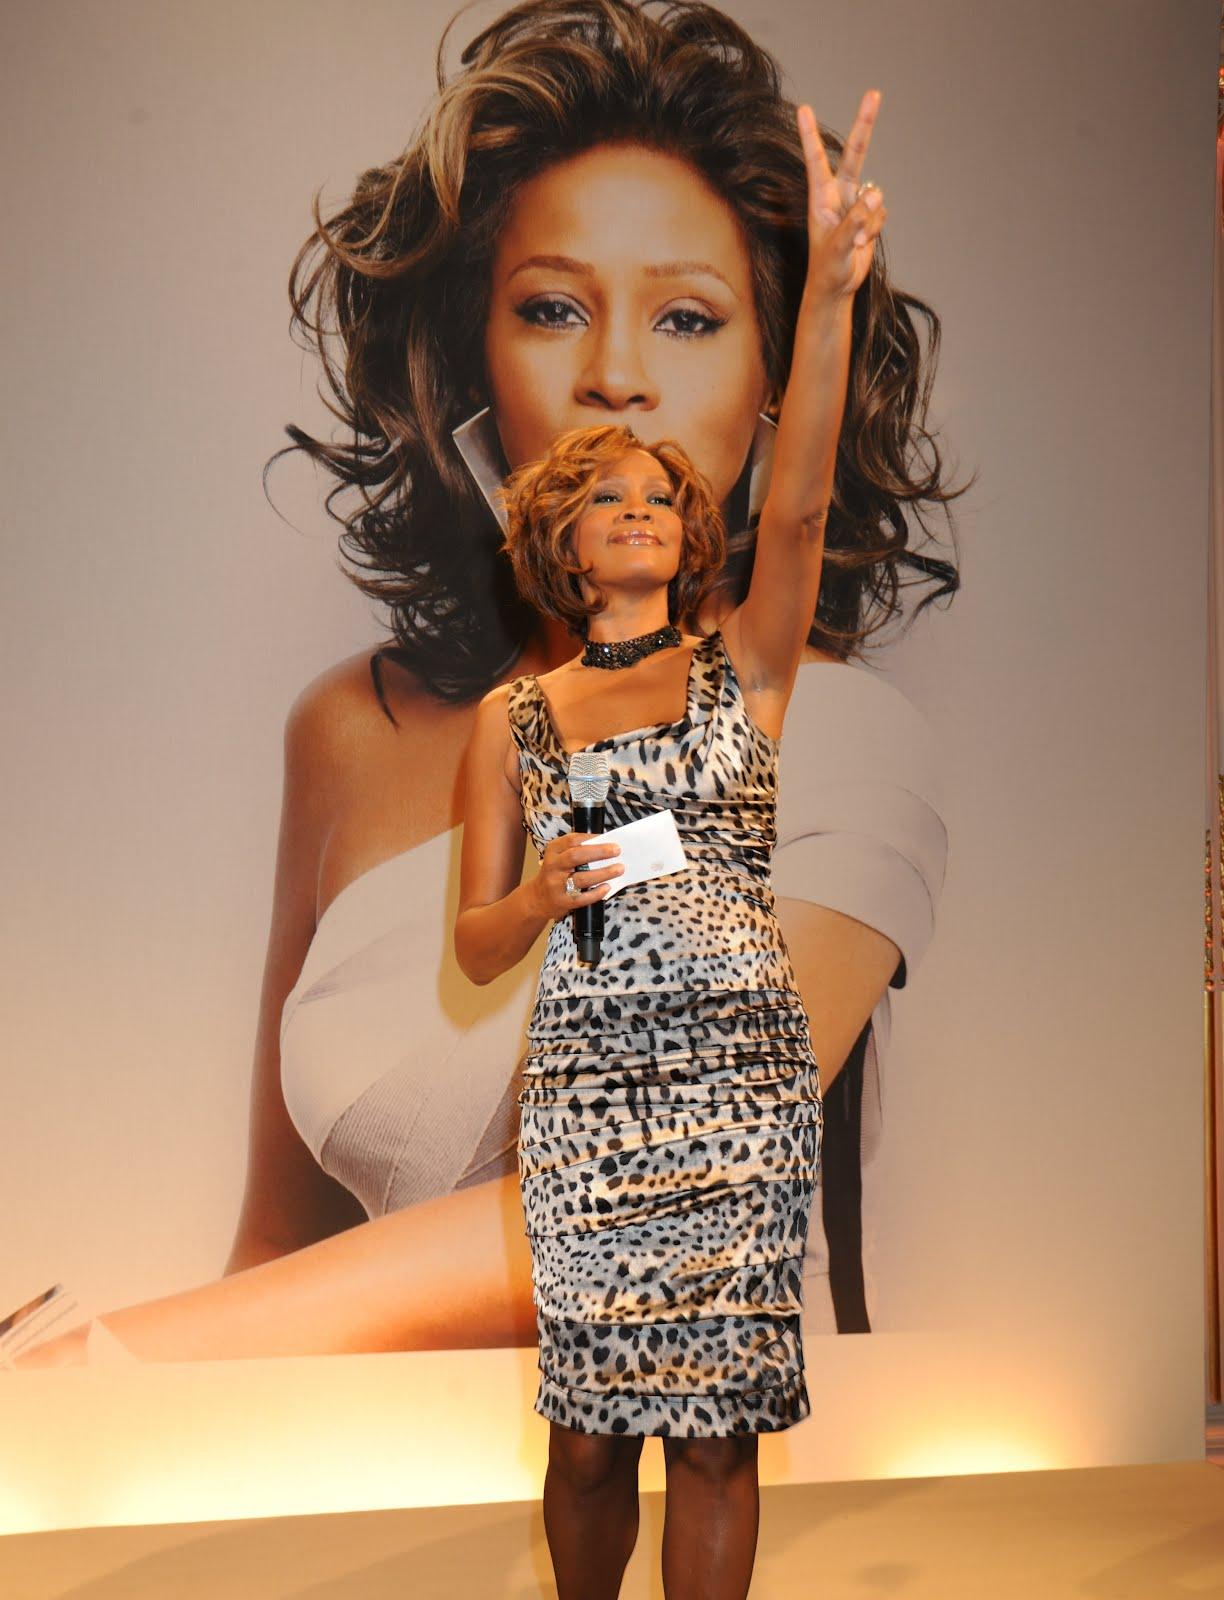 http://2.bp.blogspot.com/-VI07NIeW2ac/TztLqe1fo9I/AAAAAAAAAIc/C1LVgU7h6D0/s1600/Whitney_Houston_Dead.jpg